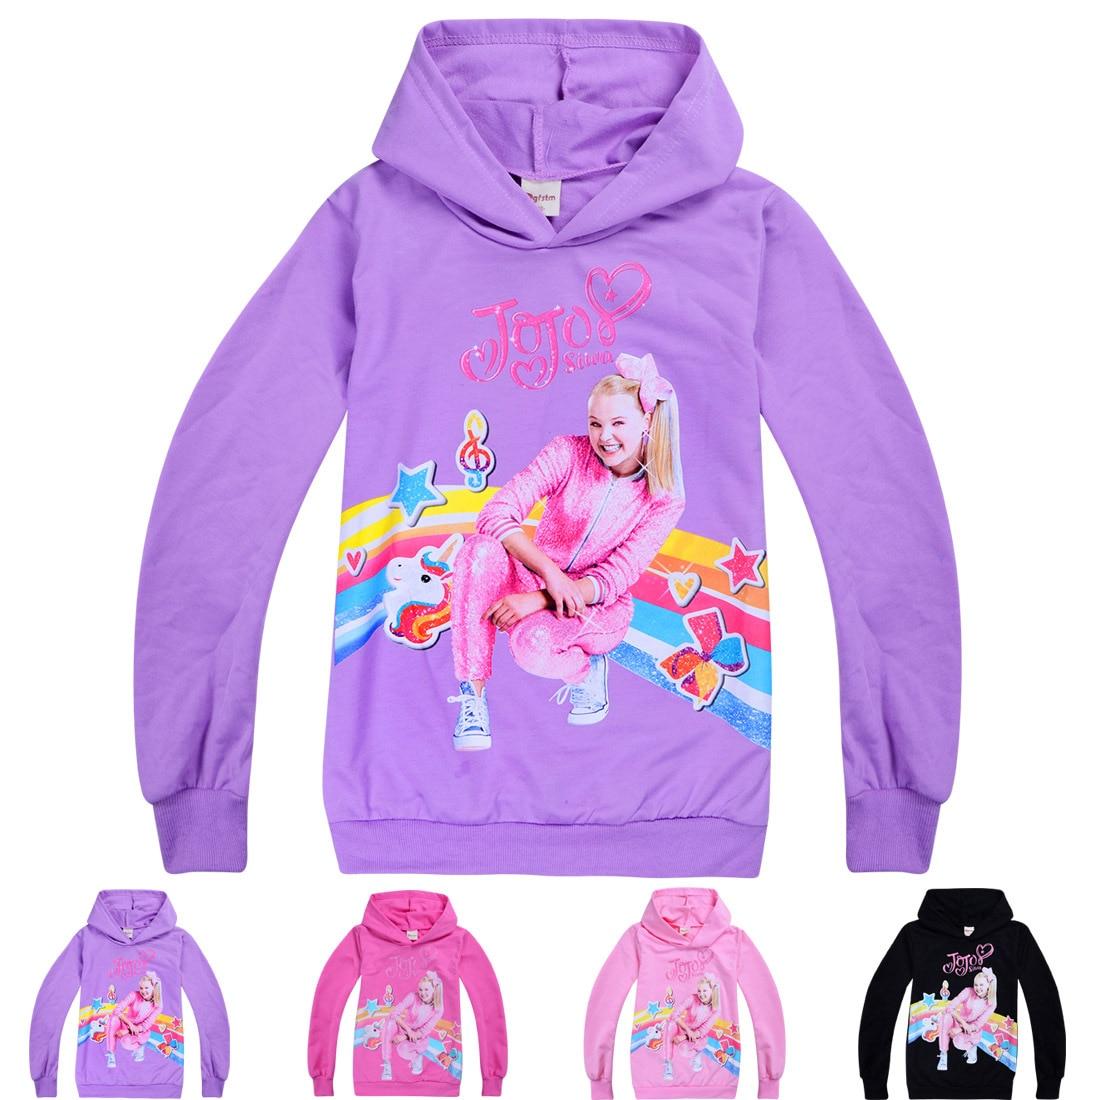 Jojo Siwa Kids Girls Hoodies Casual Cartoon SweatShirt Tops Hoodie Shirt Clothes